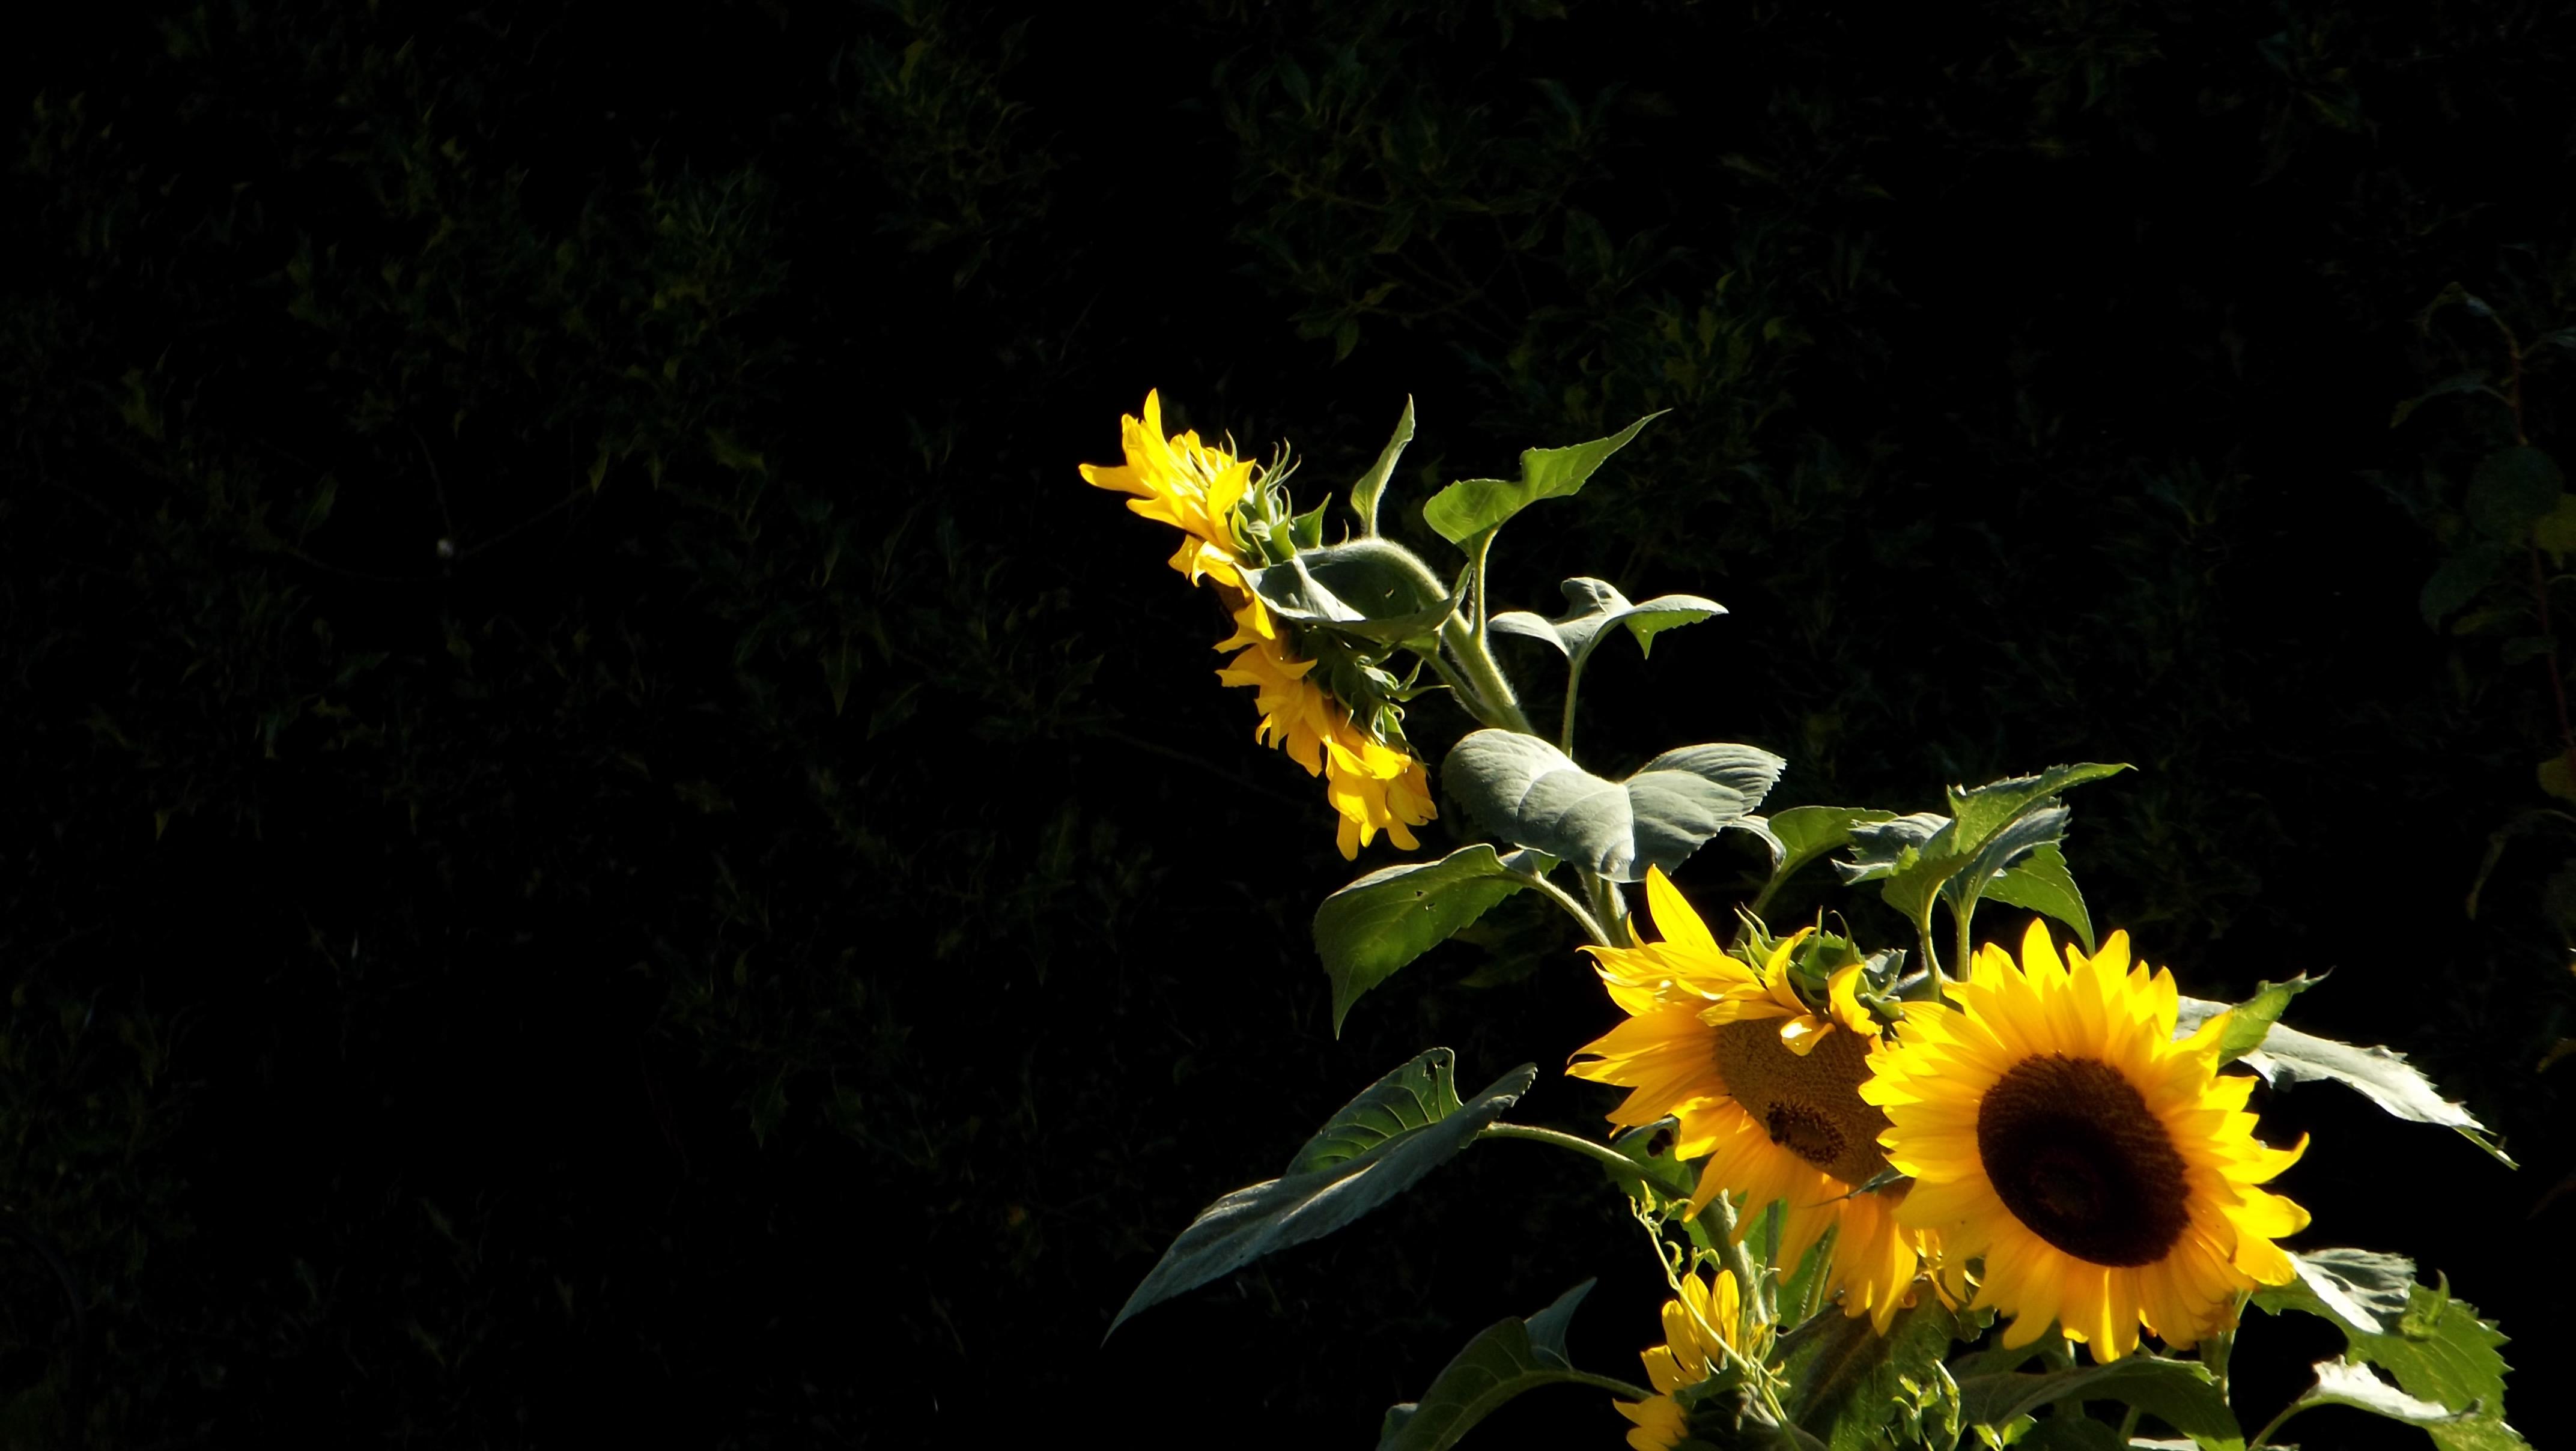 Hd Wallpaper - Hd Quality Sunflowers , HD Wallpaper & Backgrounds